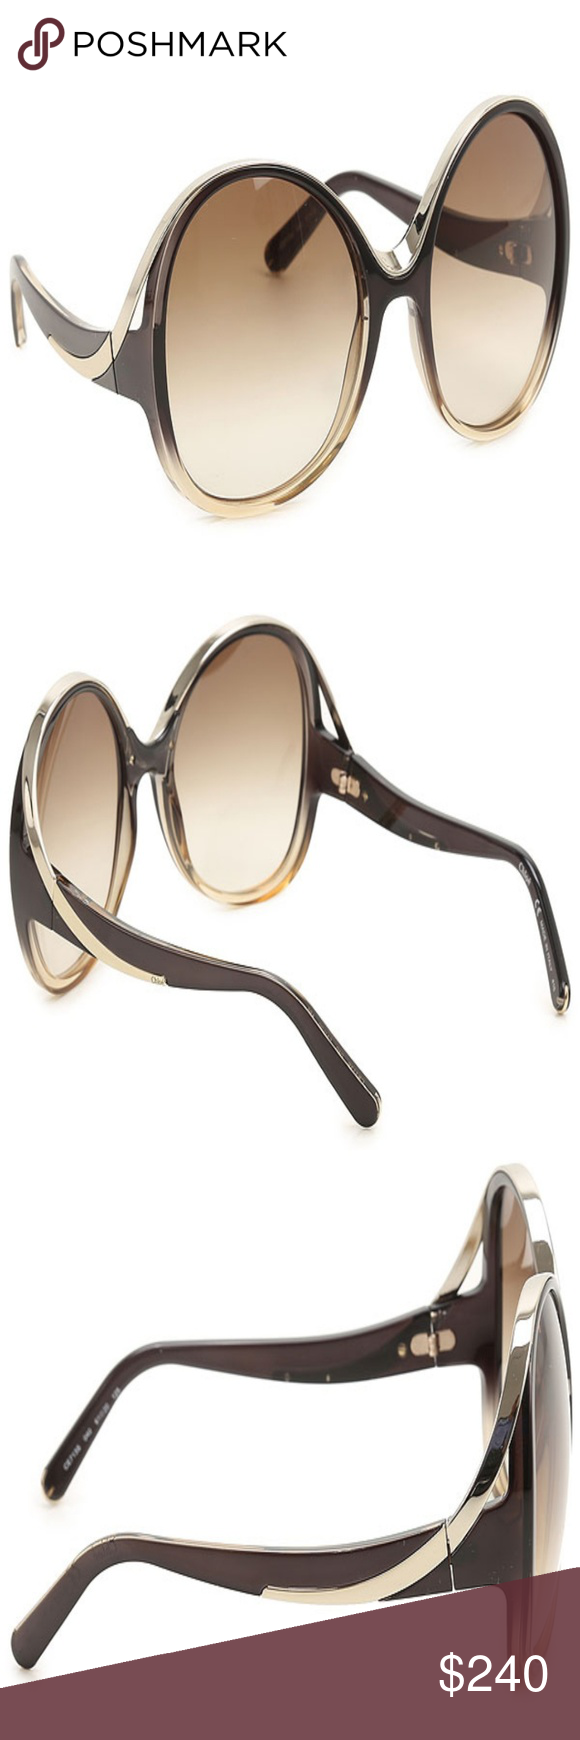 f13768b27936 Chloe Sunglasses Model Mandy Beautiful and Classy Chloe Sunglasses